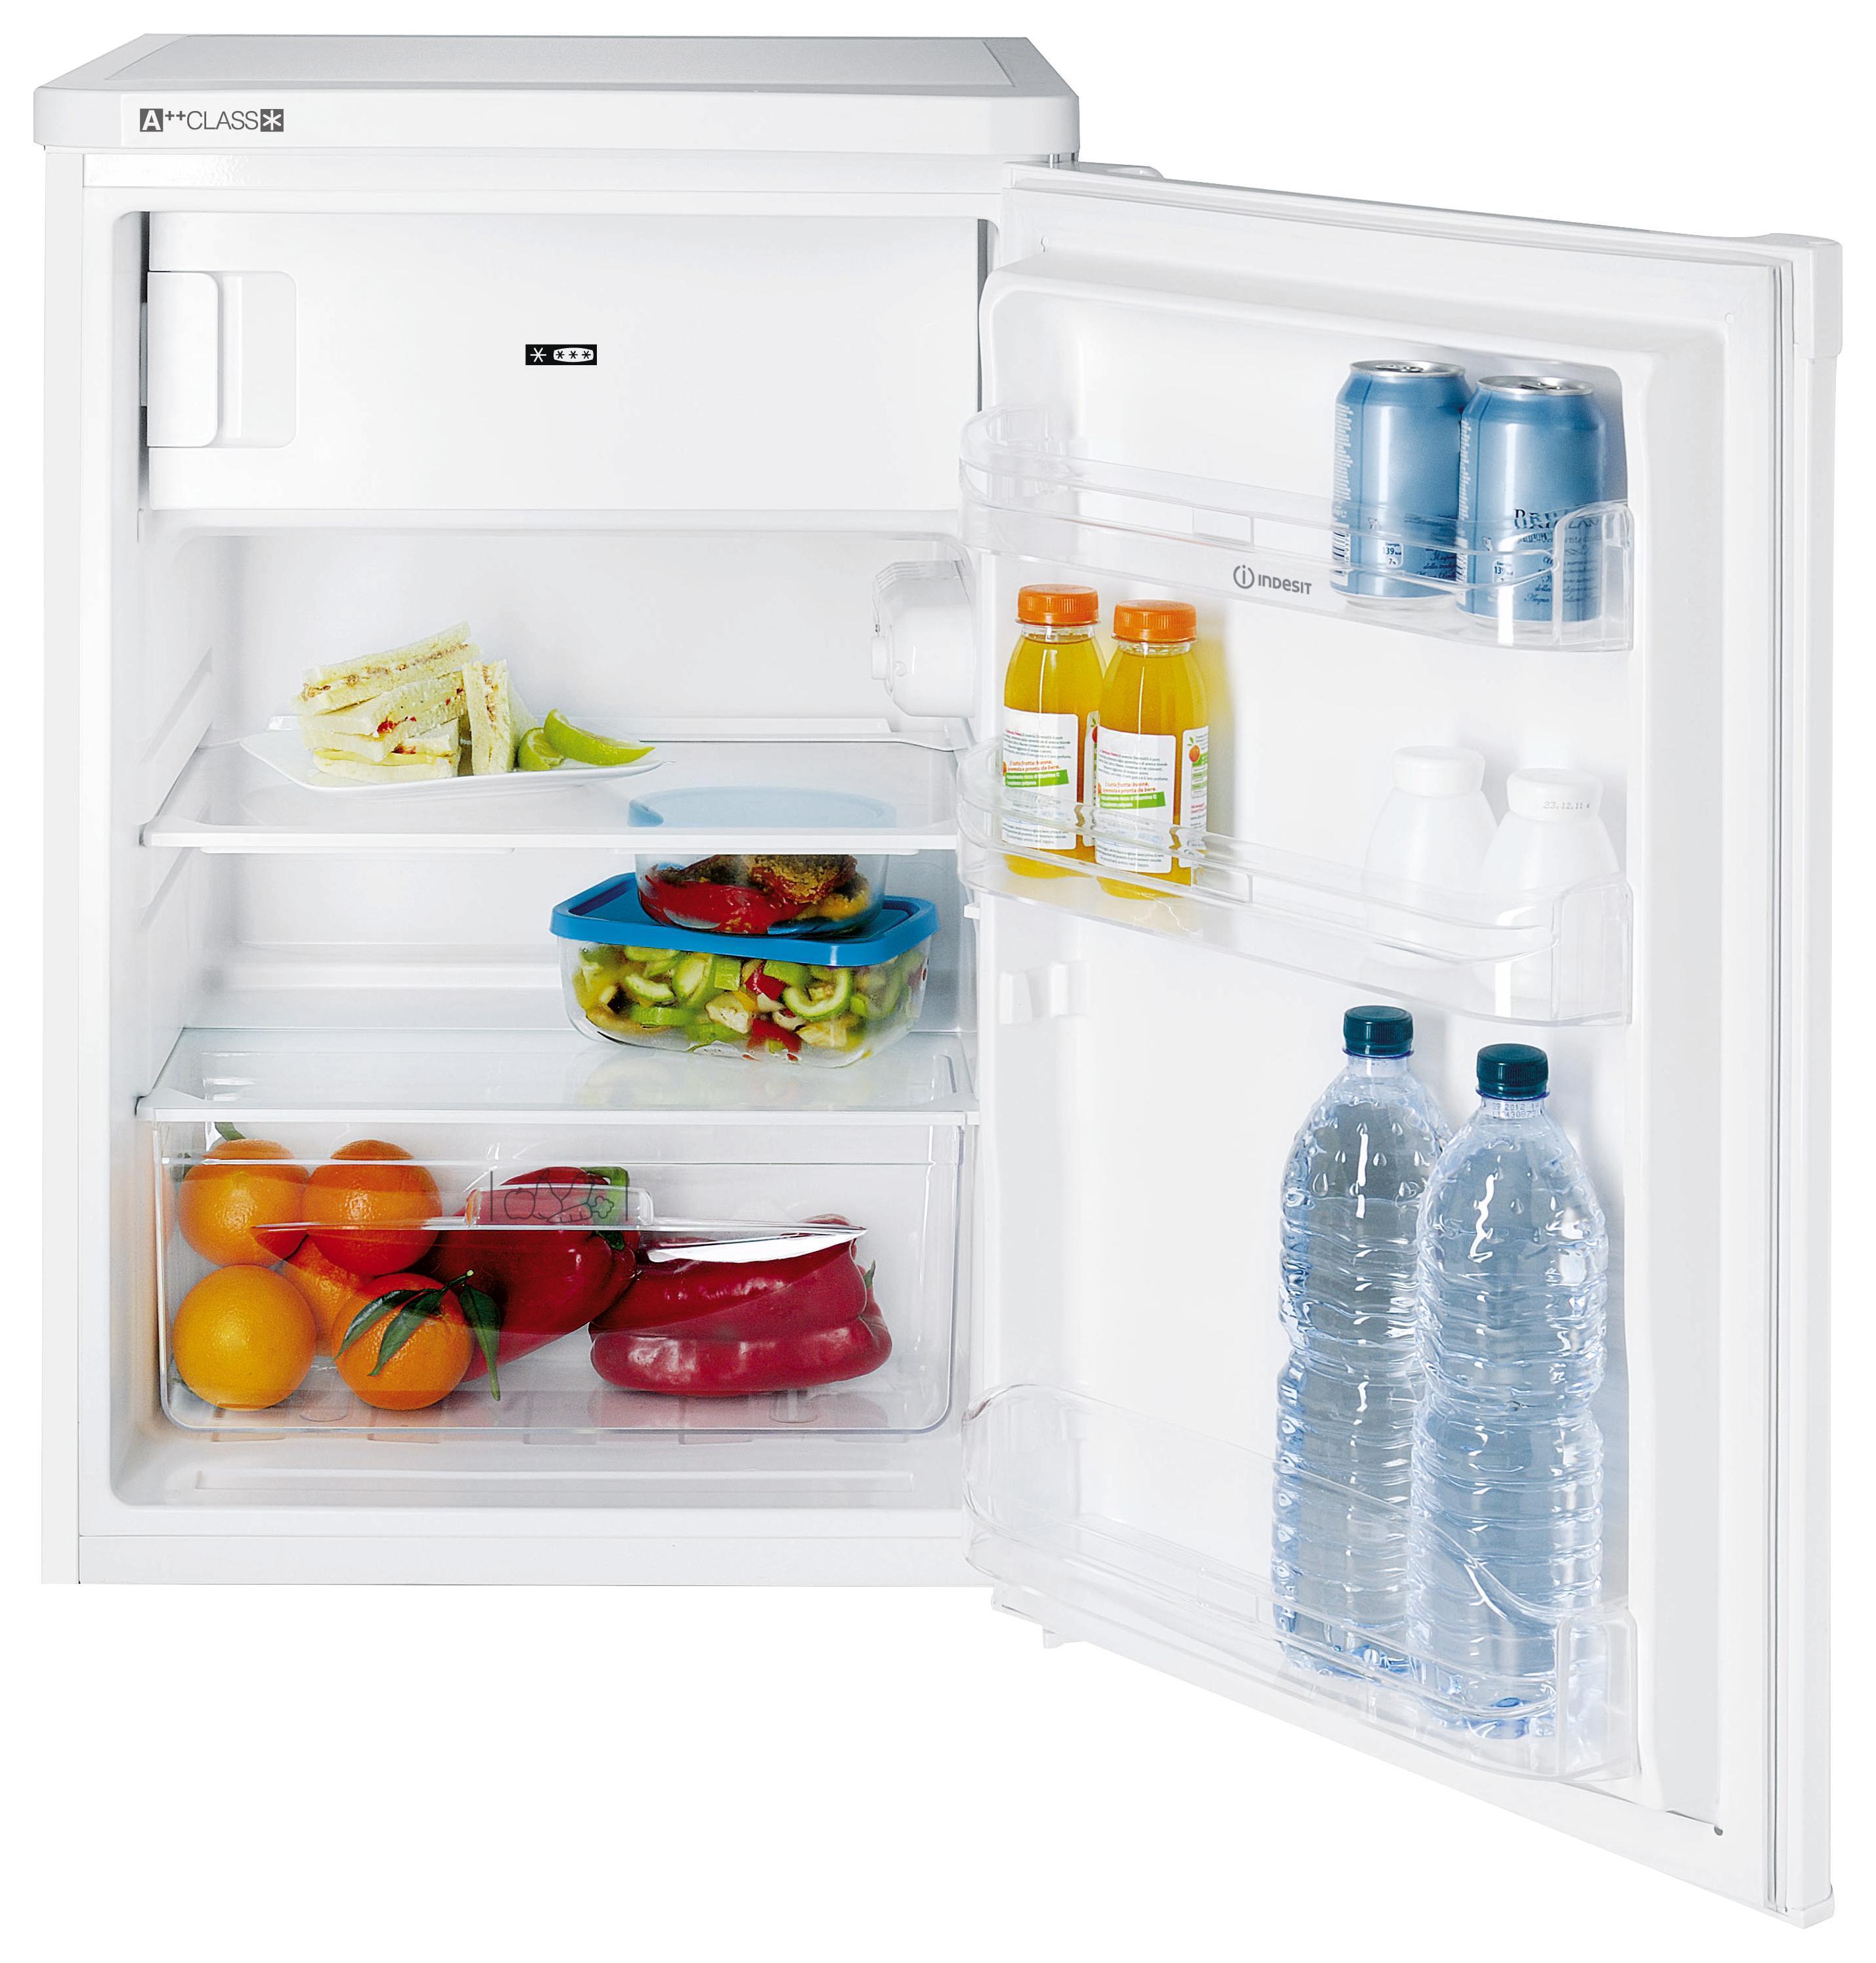 Mini Kühlschrank Auf Rechnung : Minikühlschrank tfaaa online kaufen ➤ möbelix